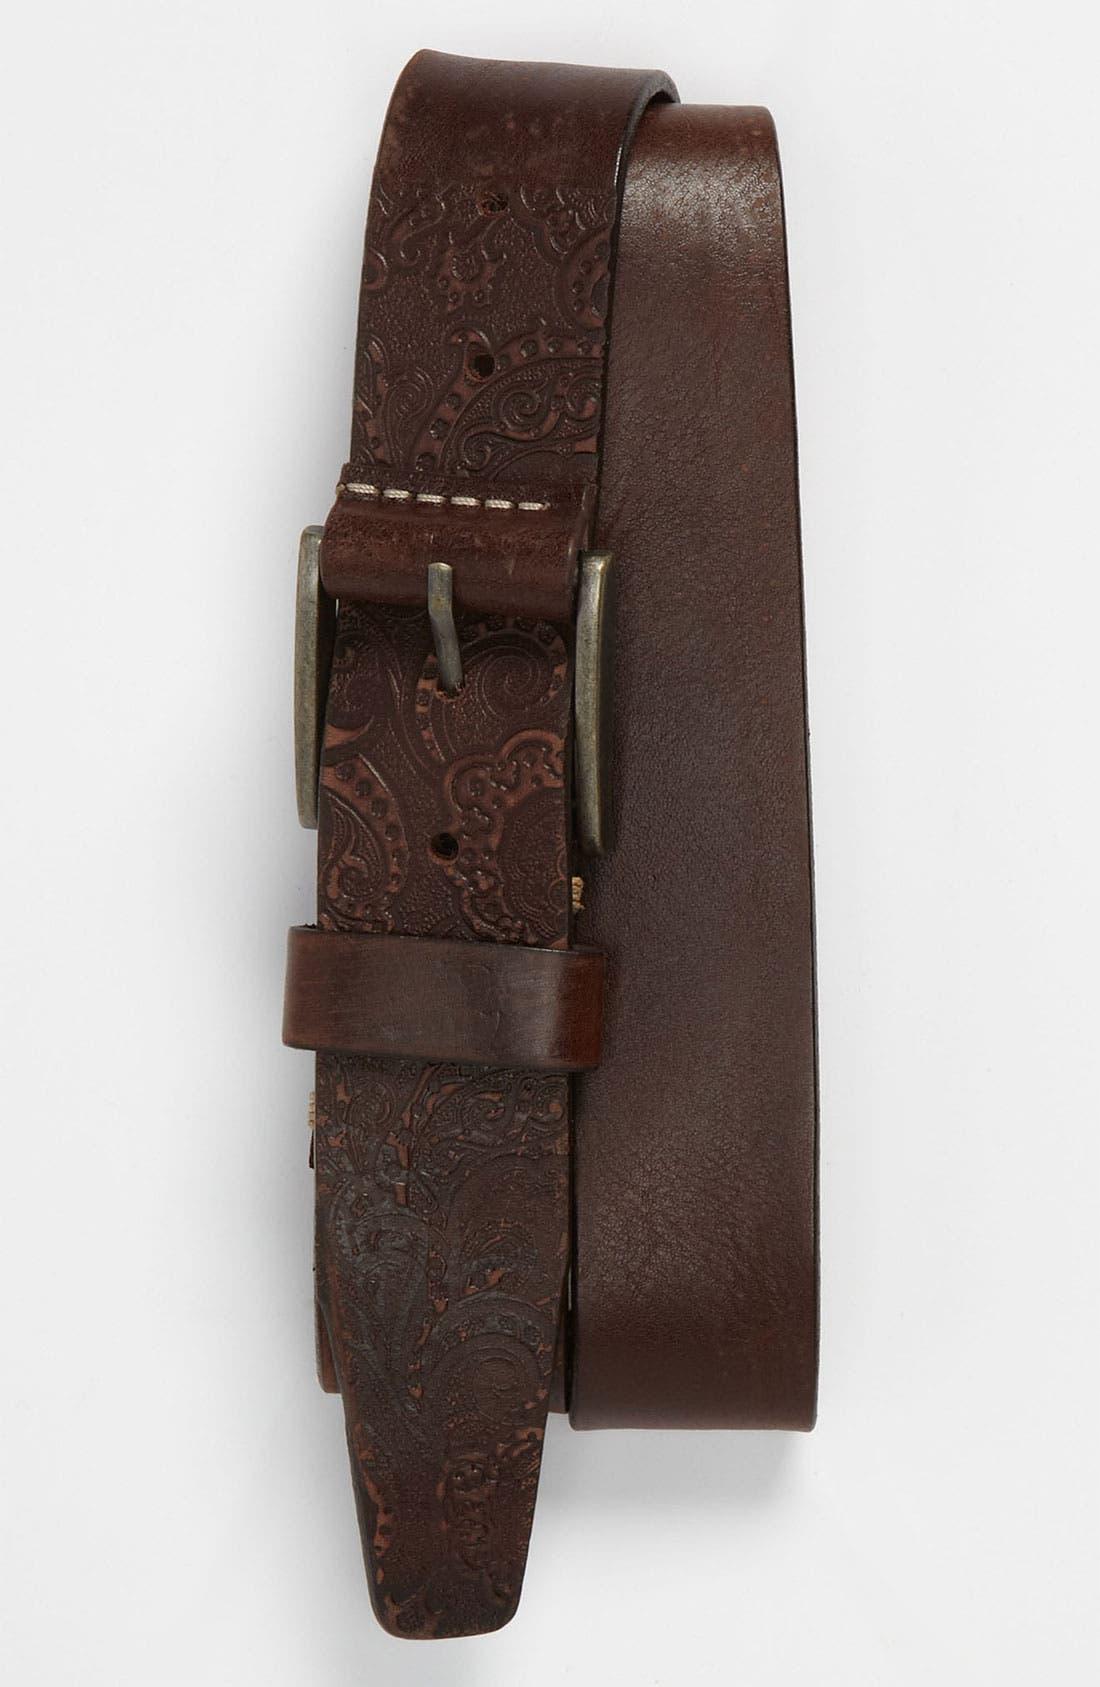 Alternate Image 1 Selected - Robert Graham 'Penniman' Leather Belt